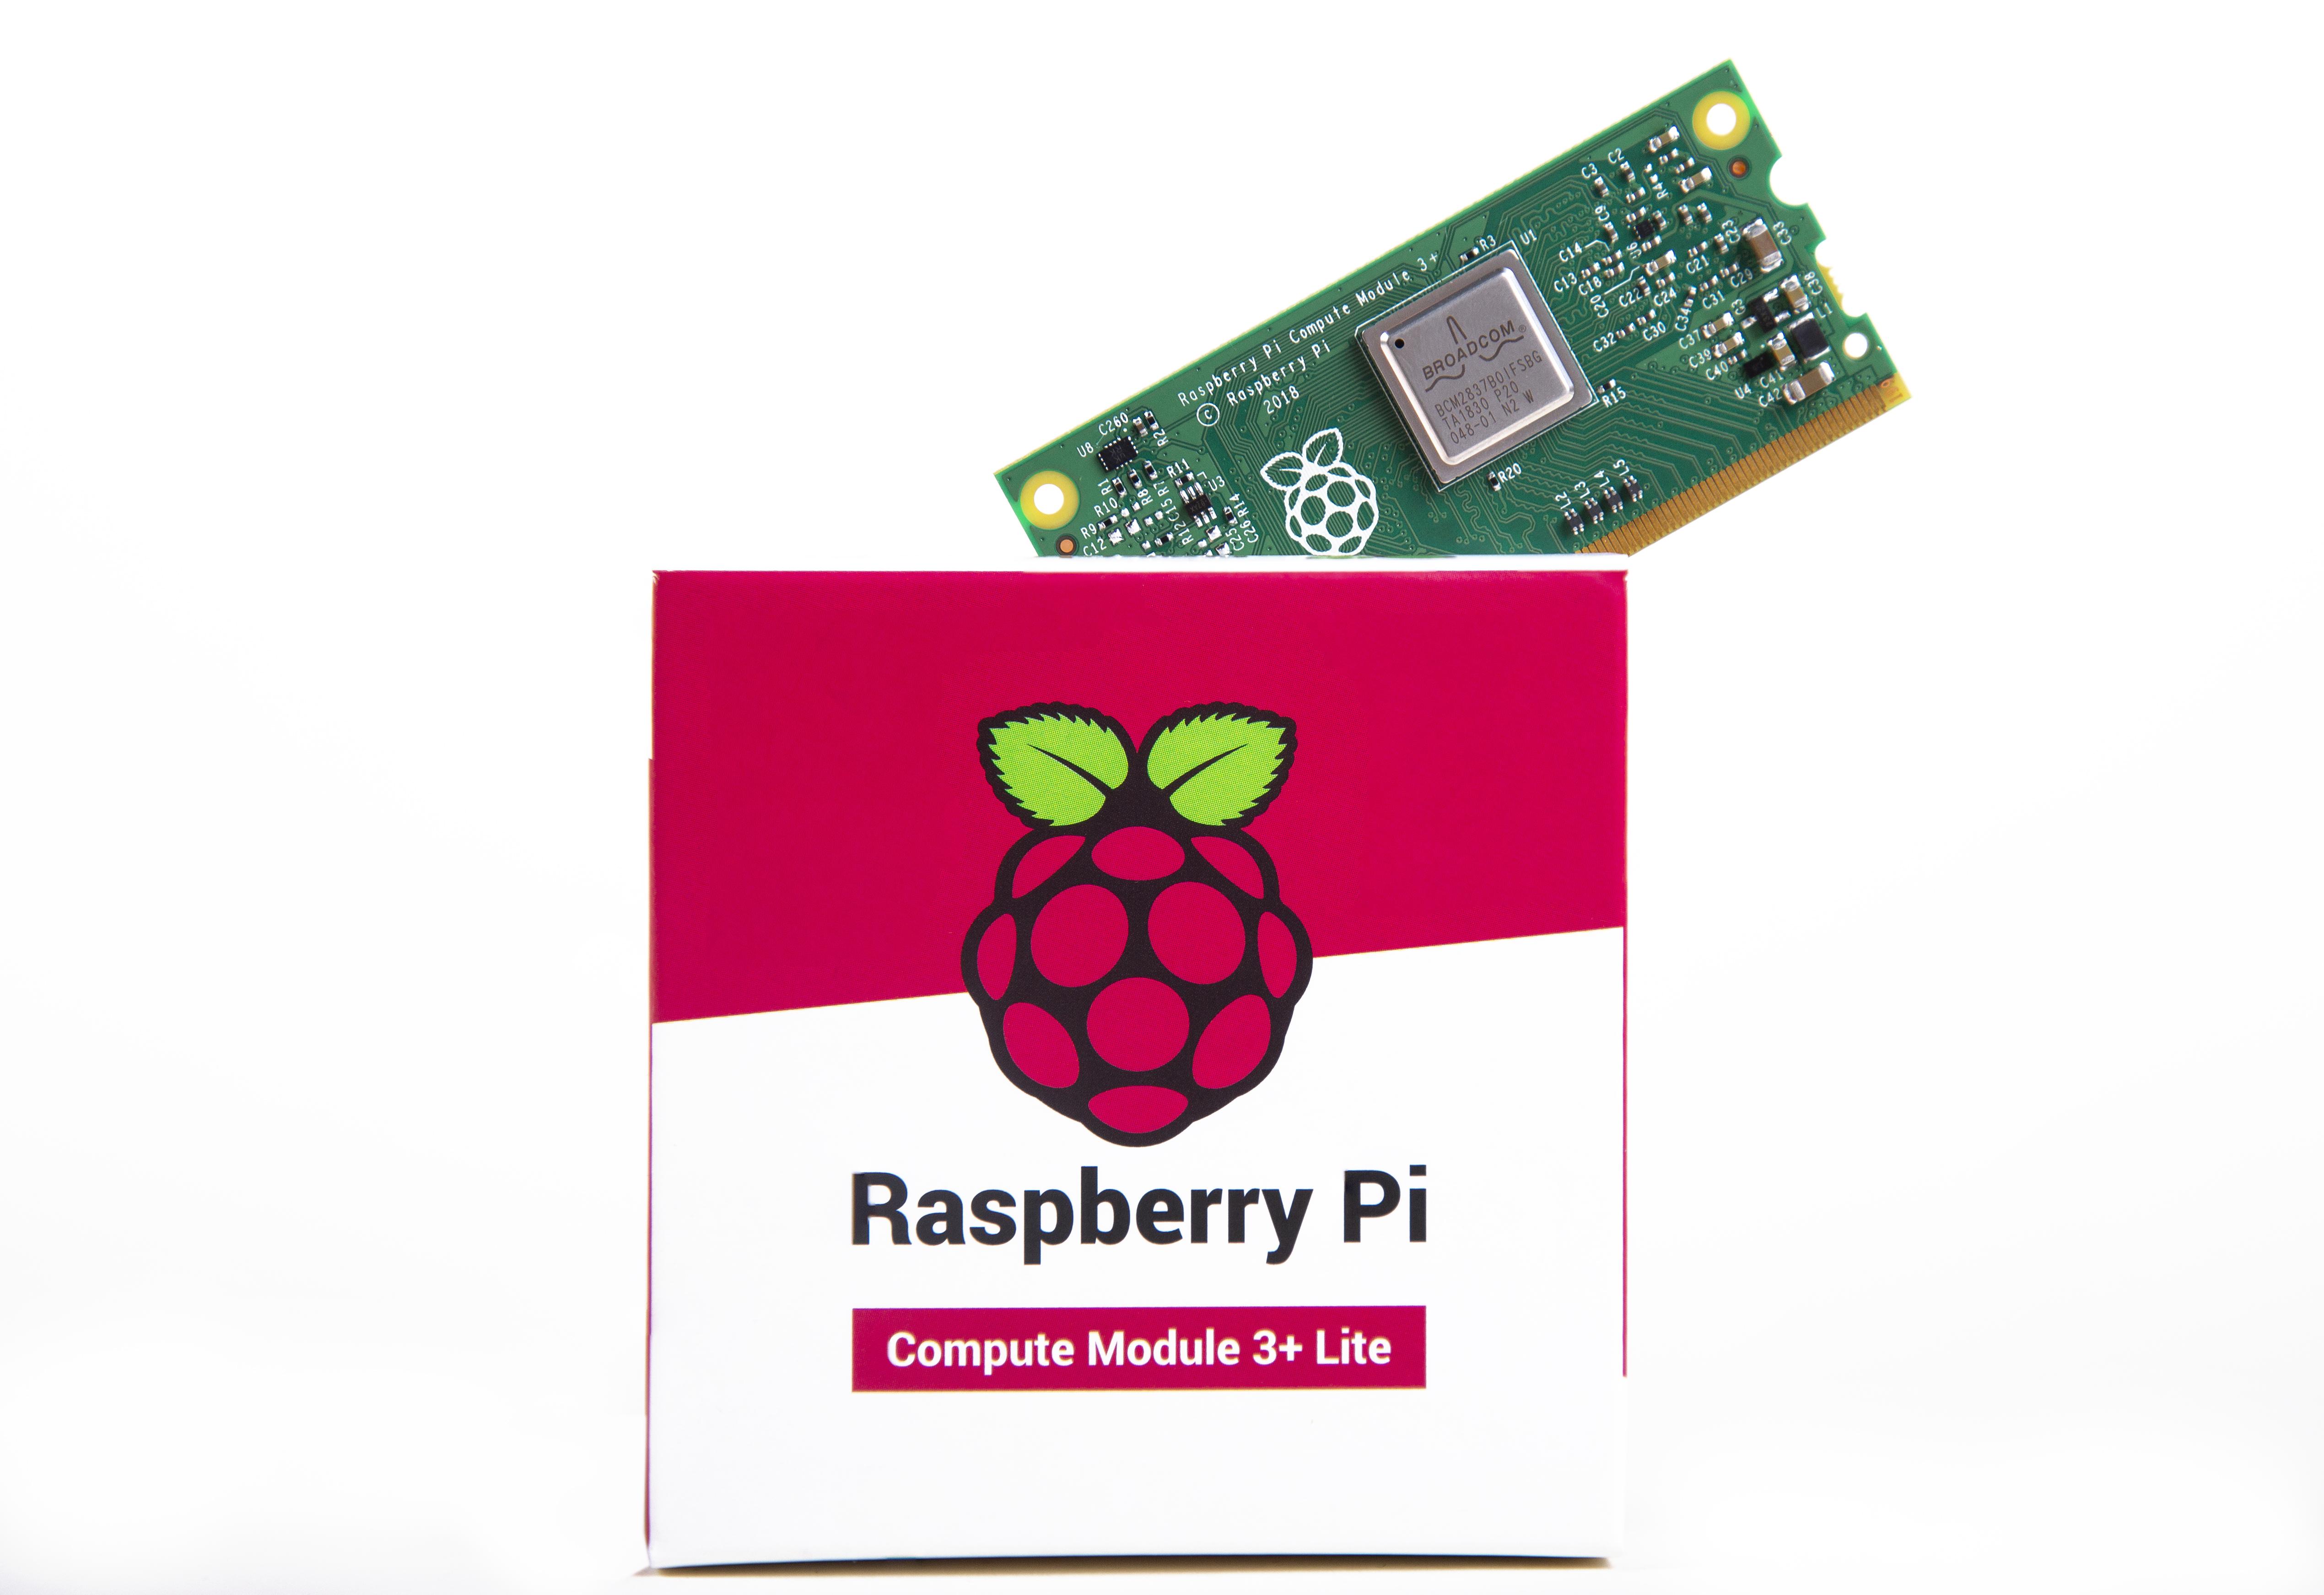 Raspberry Pi(ラズベリーパイ)コンピュートモジュール3 + ライト